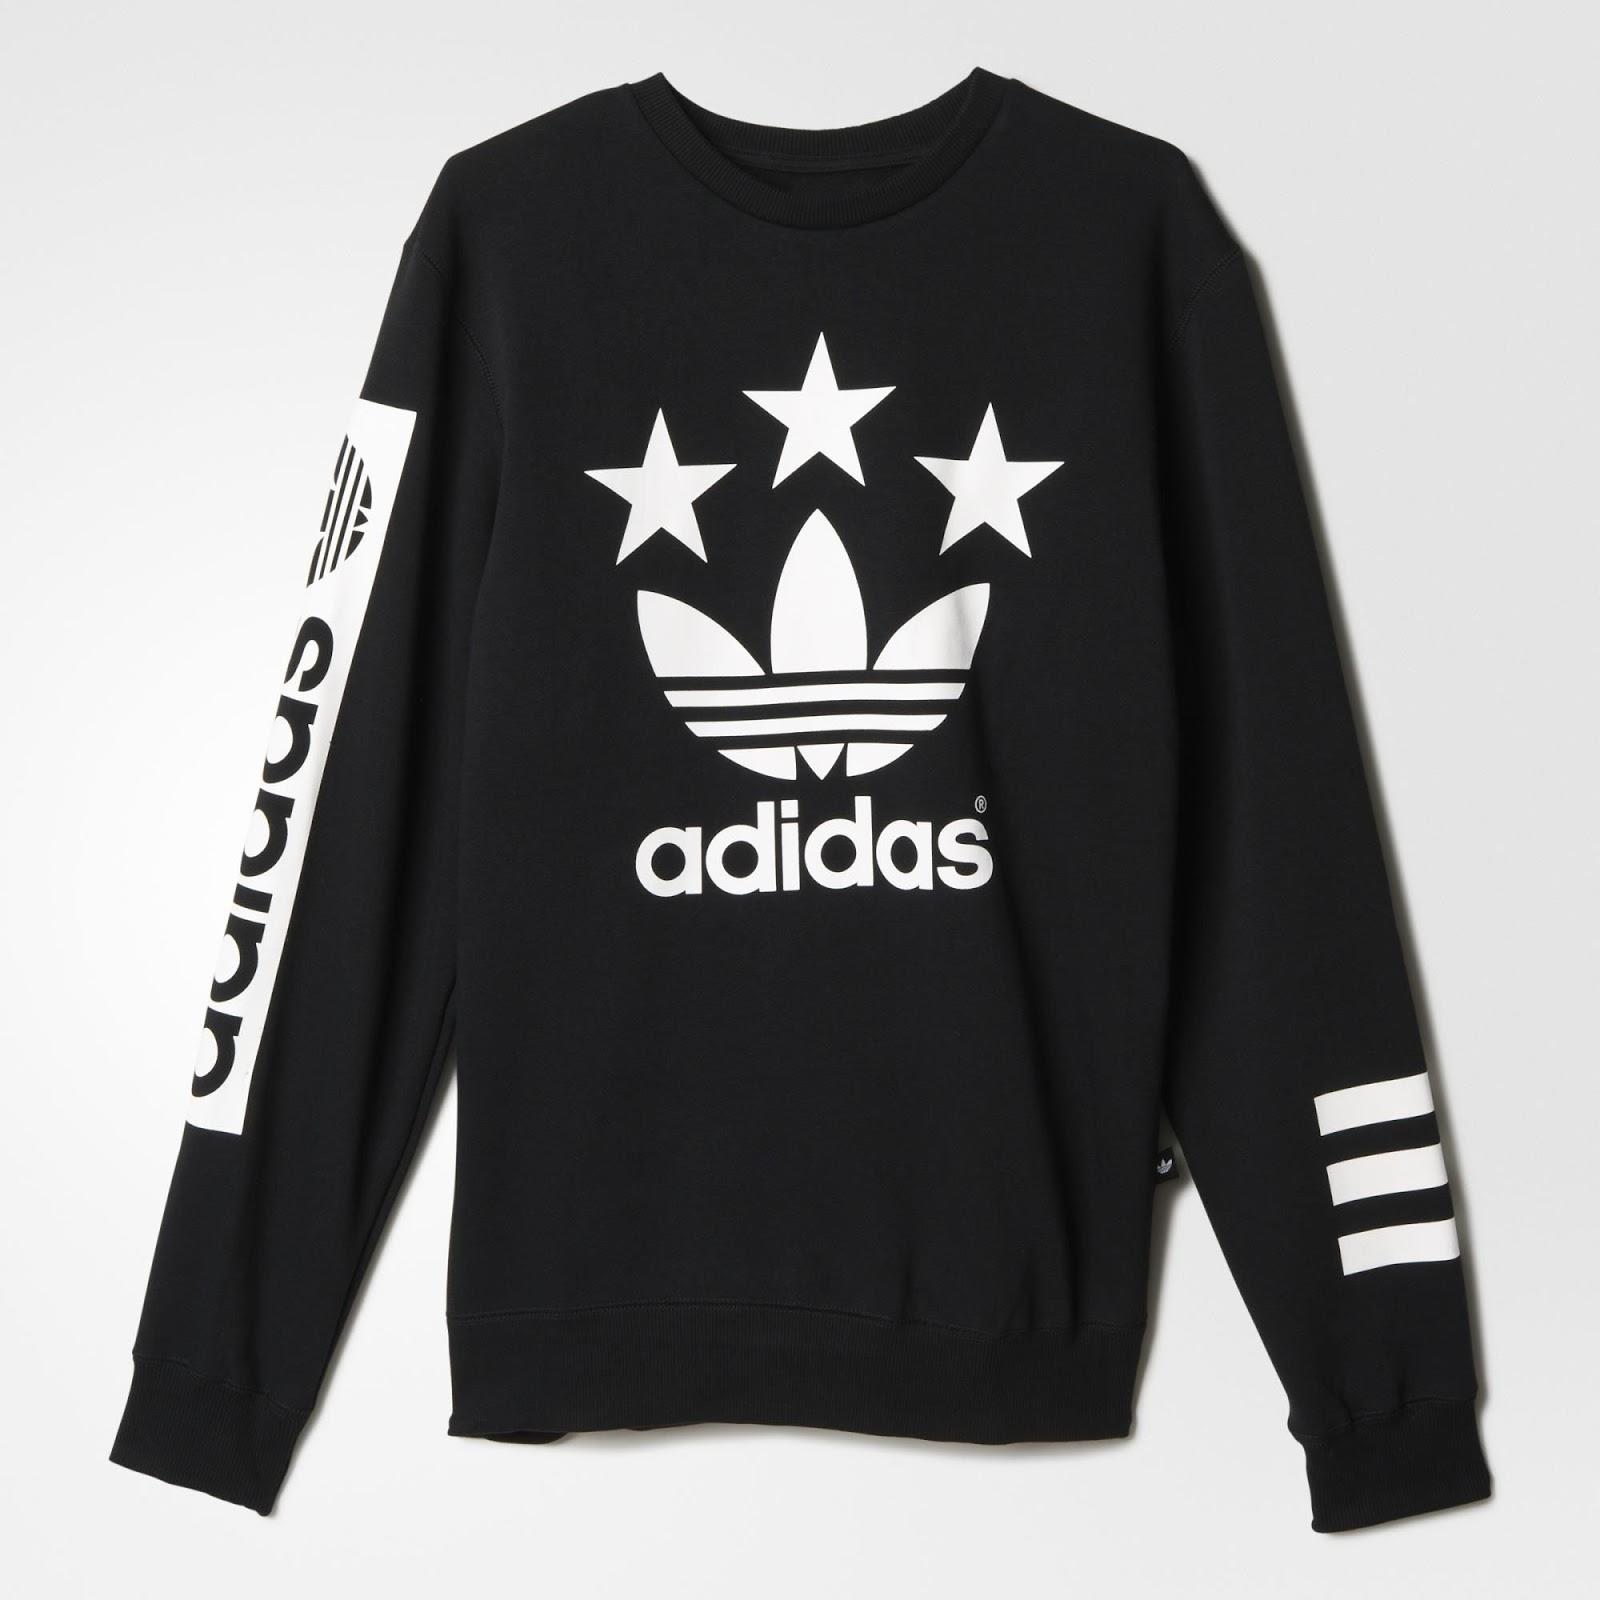 4c4e7b6b680 Sneakers and Streetwear stuff  adidas Originals - Street Logo Crew